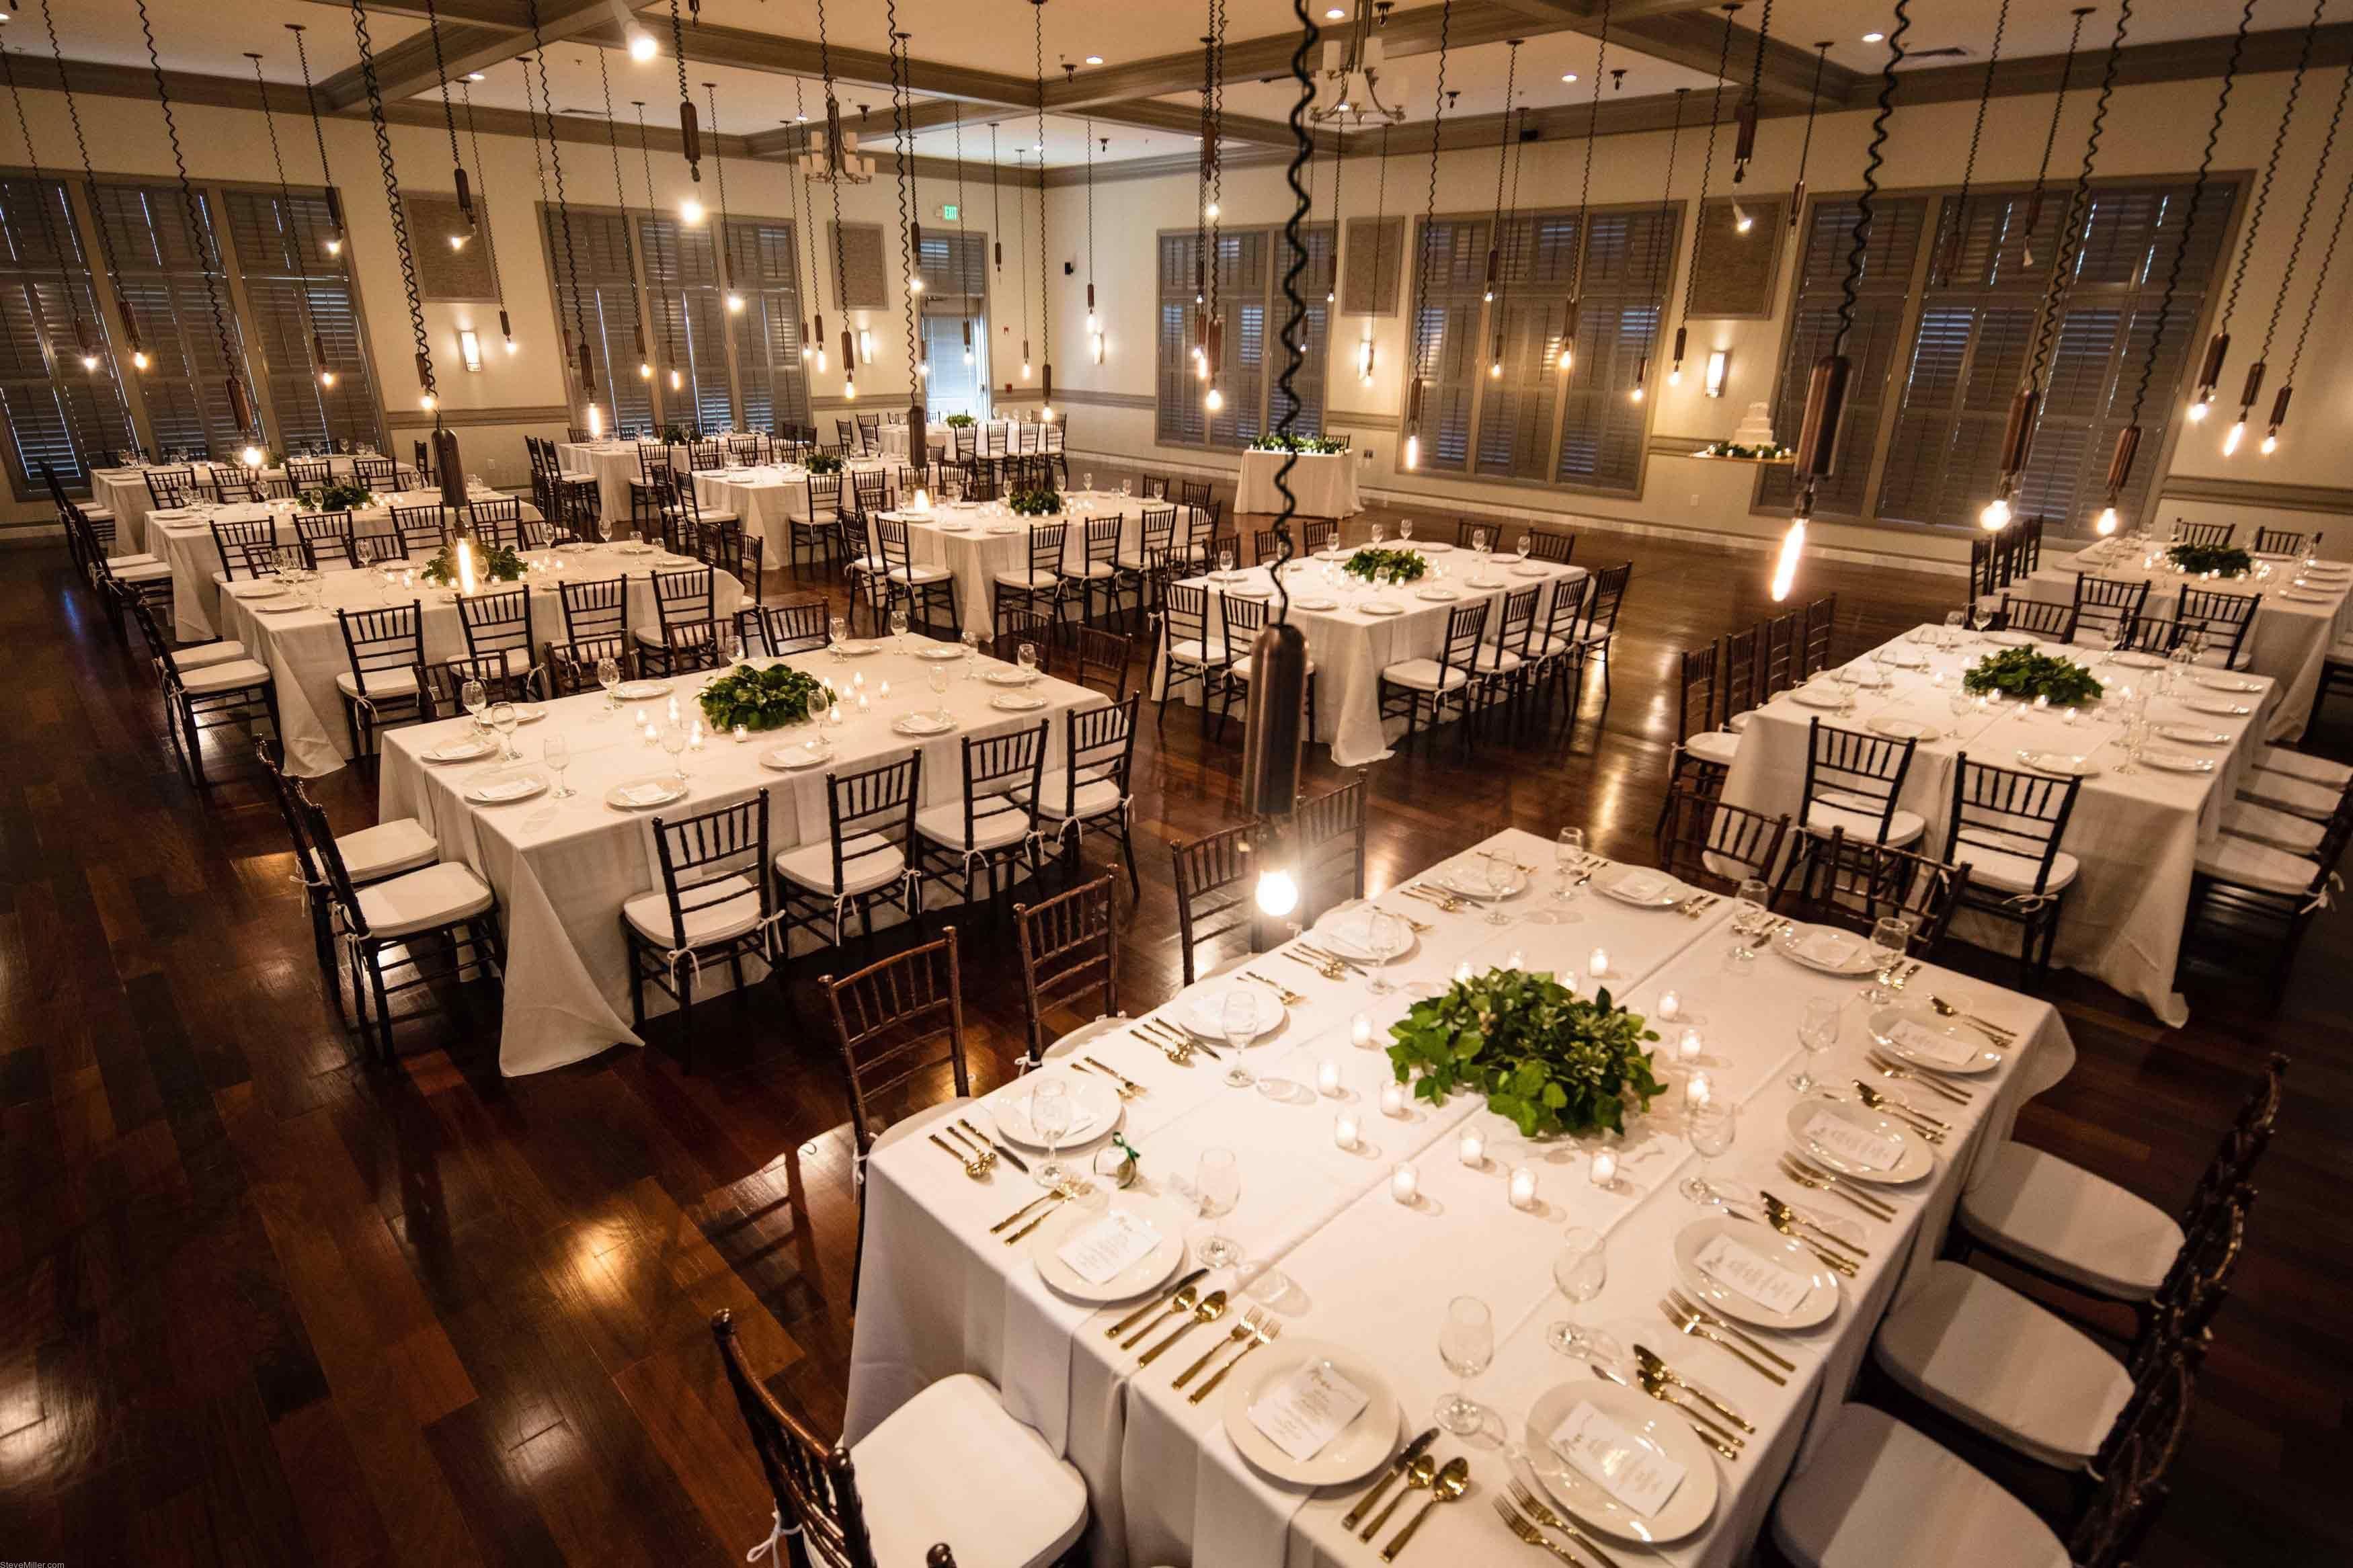 Wedding venues in virginia beach va  Home  NOAHS EVENT VENUE  location Utah big day  Pinterest